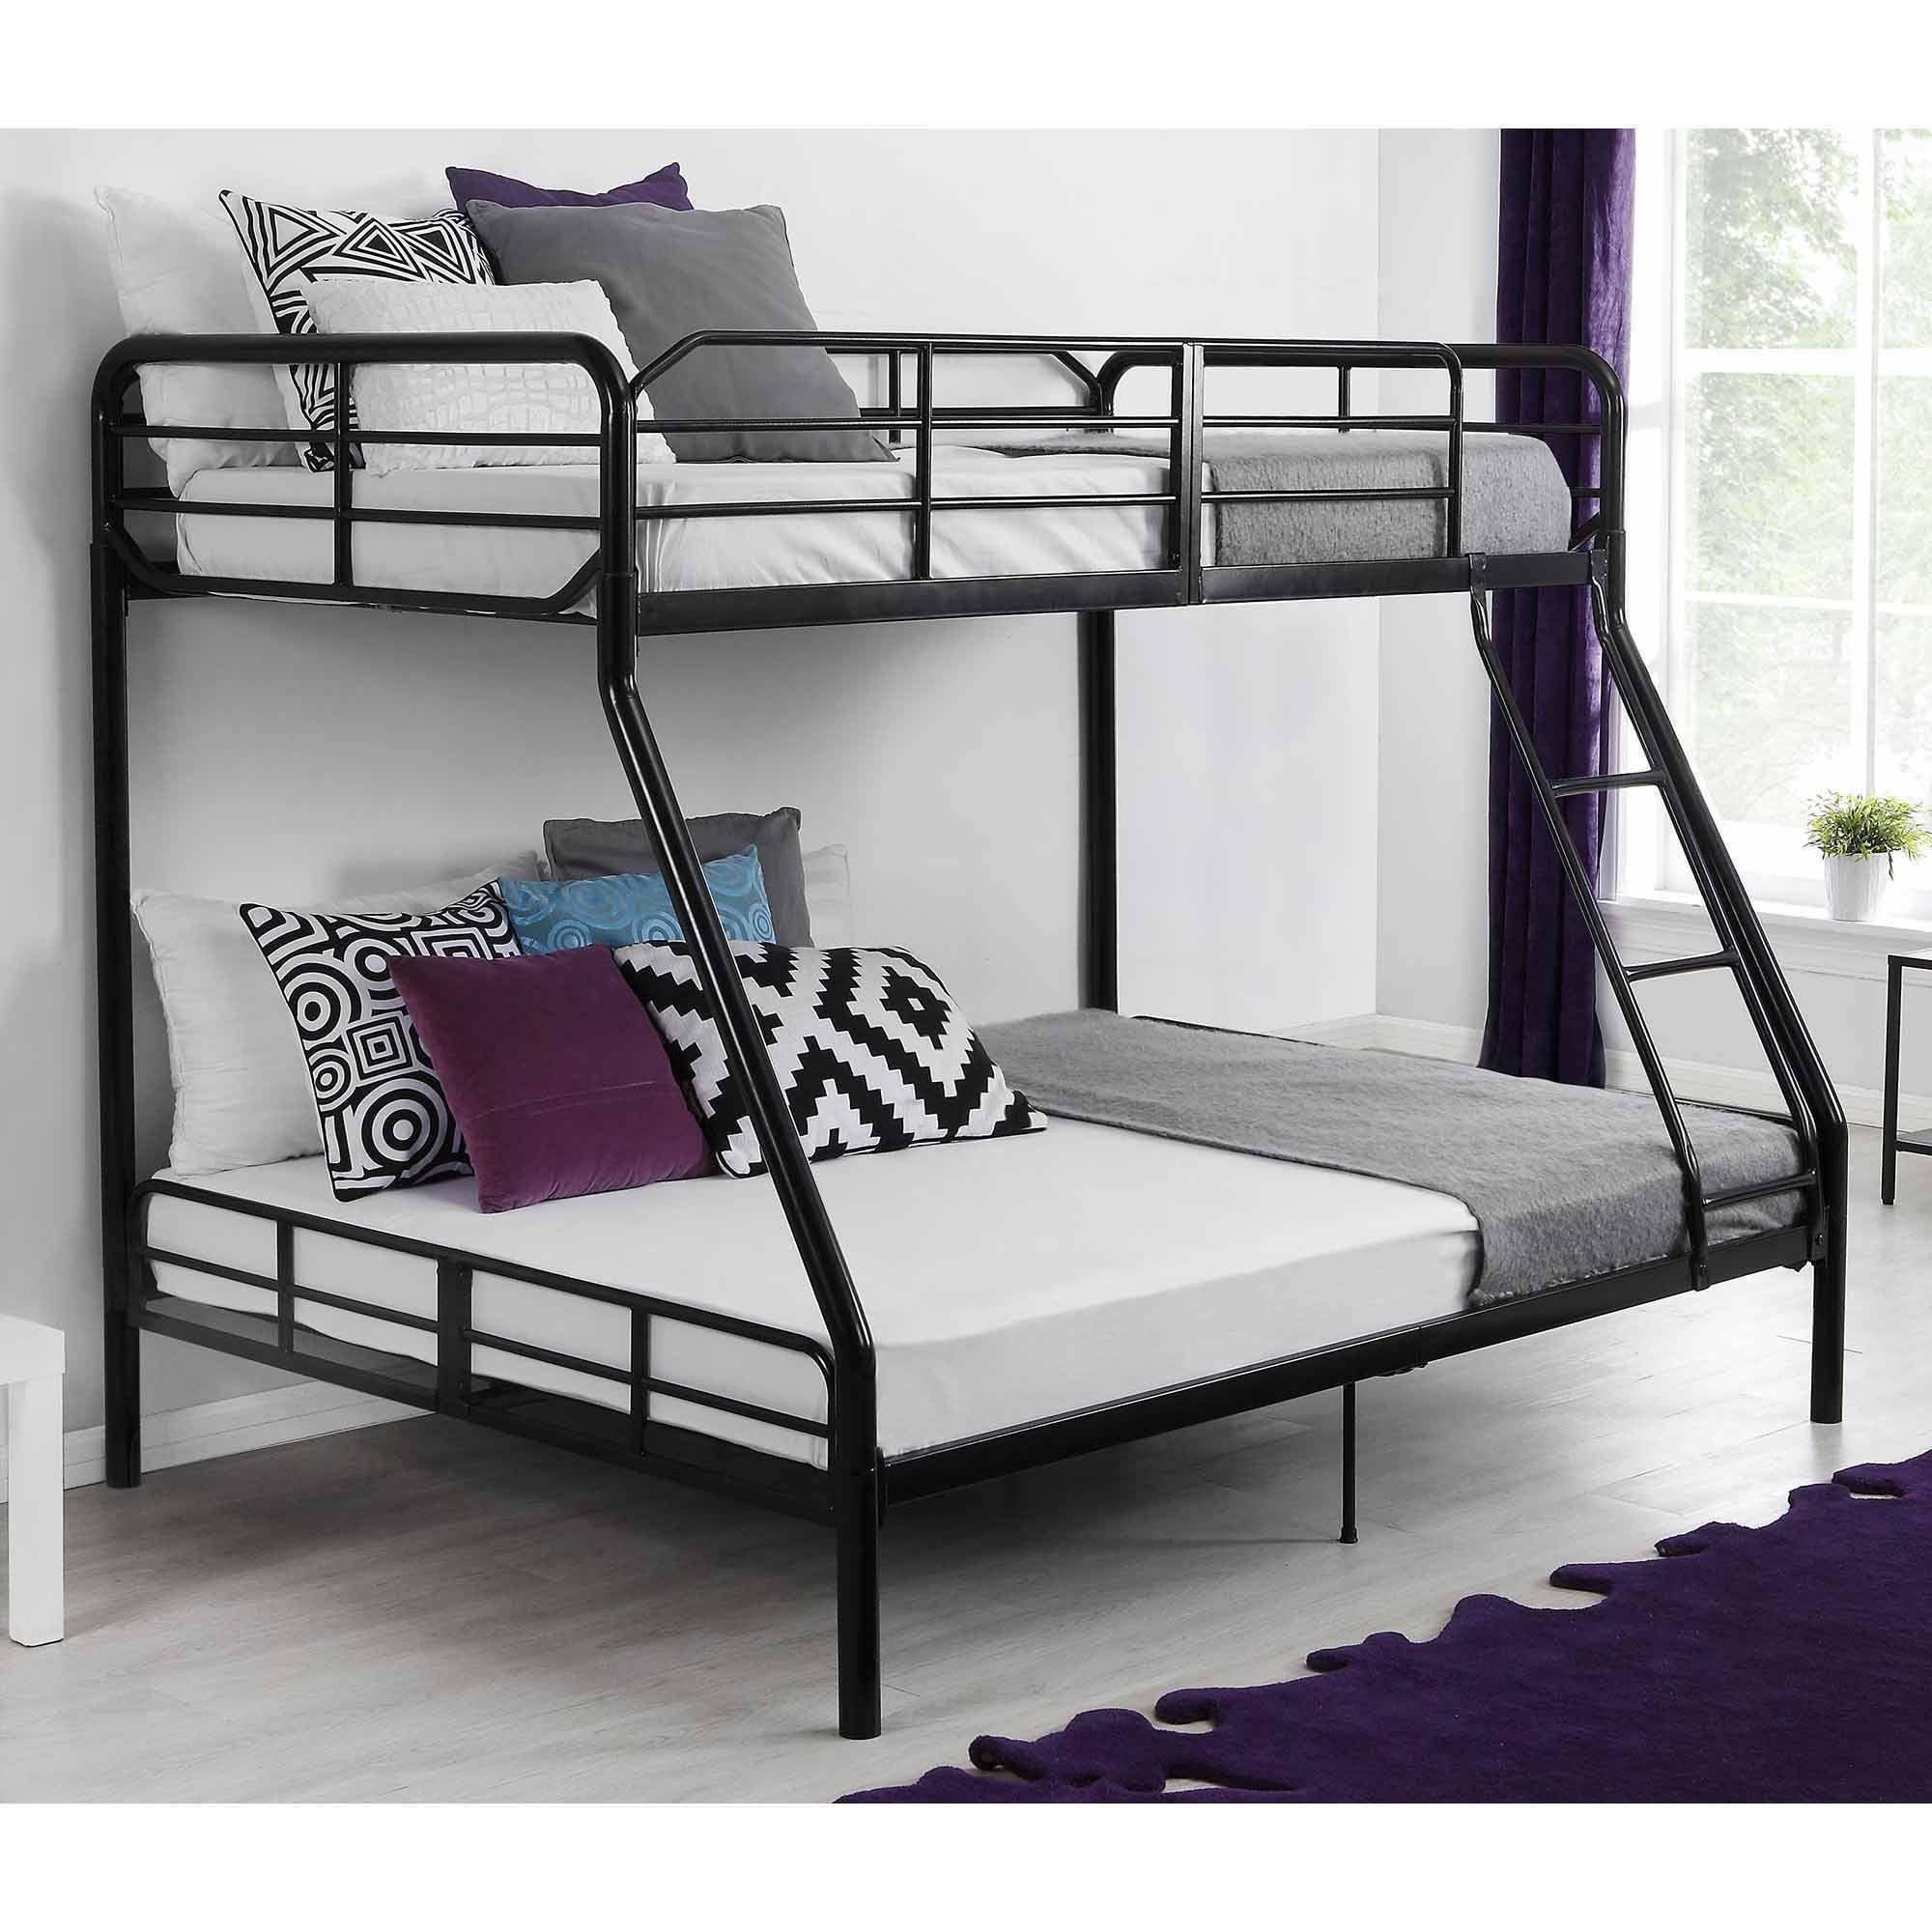 Mainstays Twin Over Full Metal Sturdy Bunk Bed Black Walmart Com Walmart Com